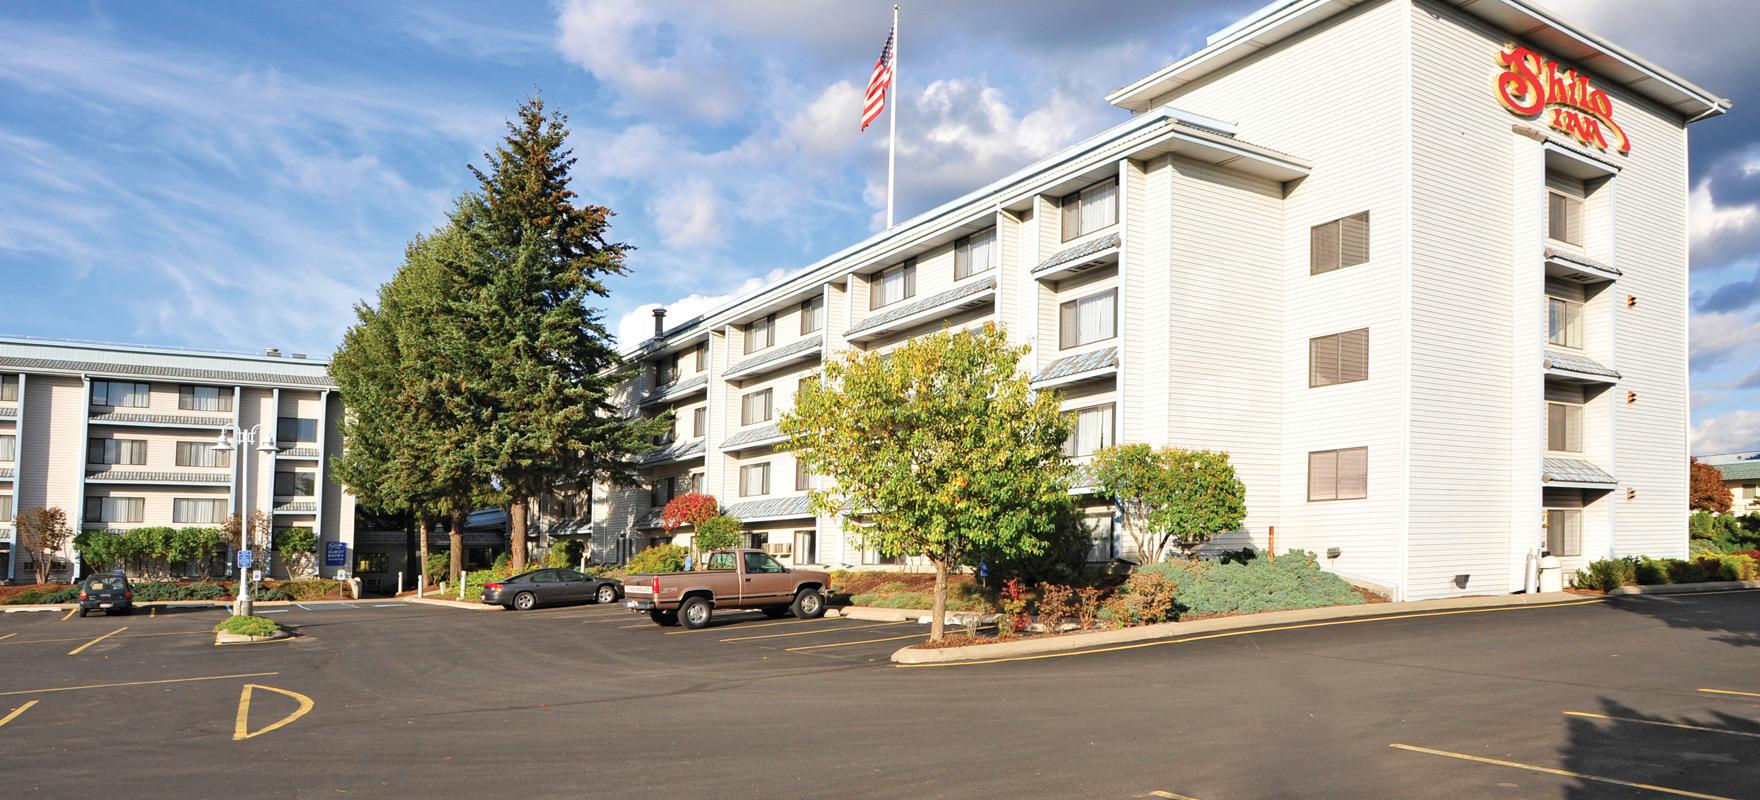 Shilo Inns Suites Hotels Coeur D 39 Alene Idaho